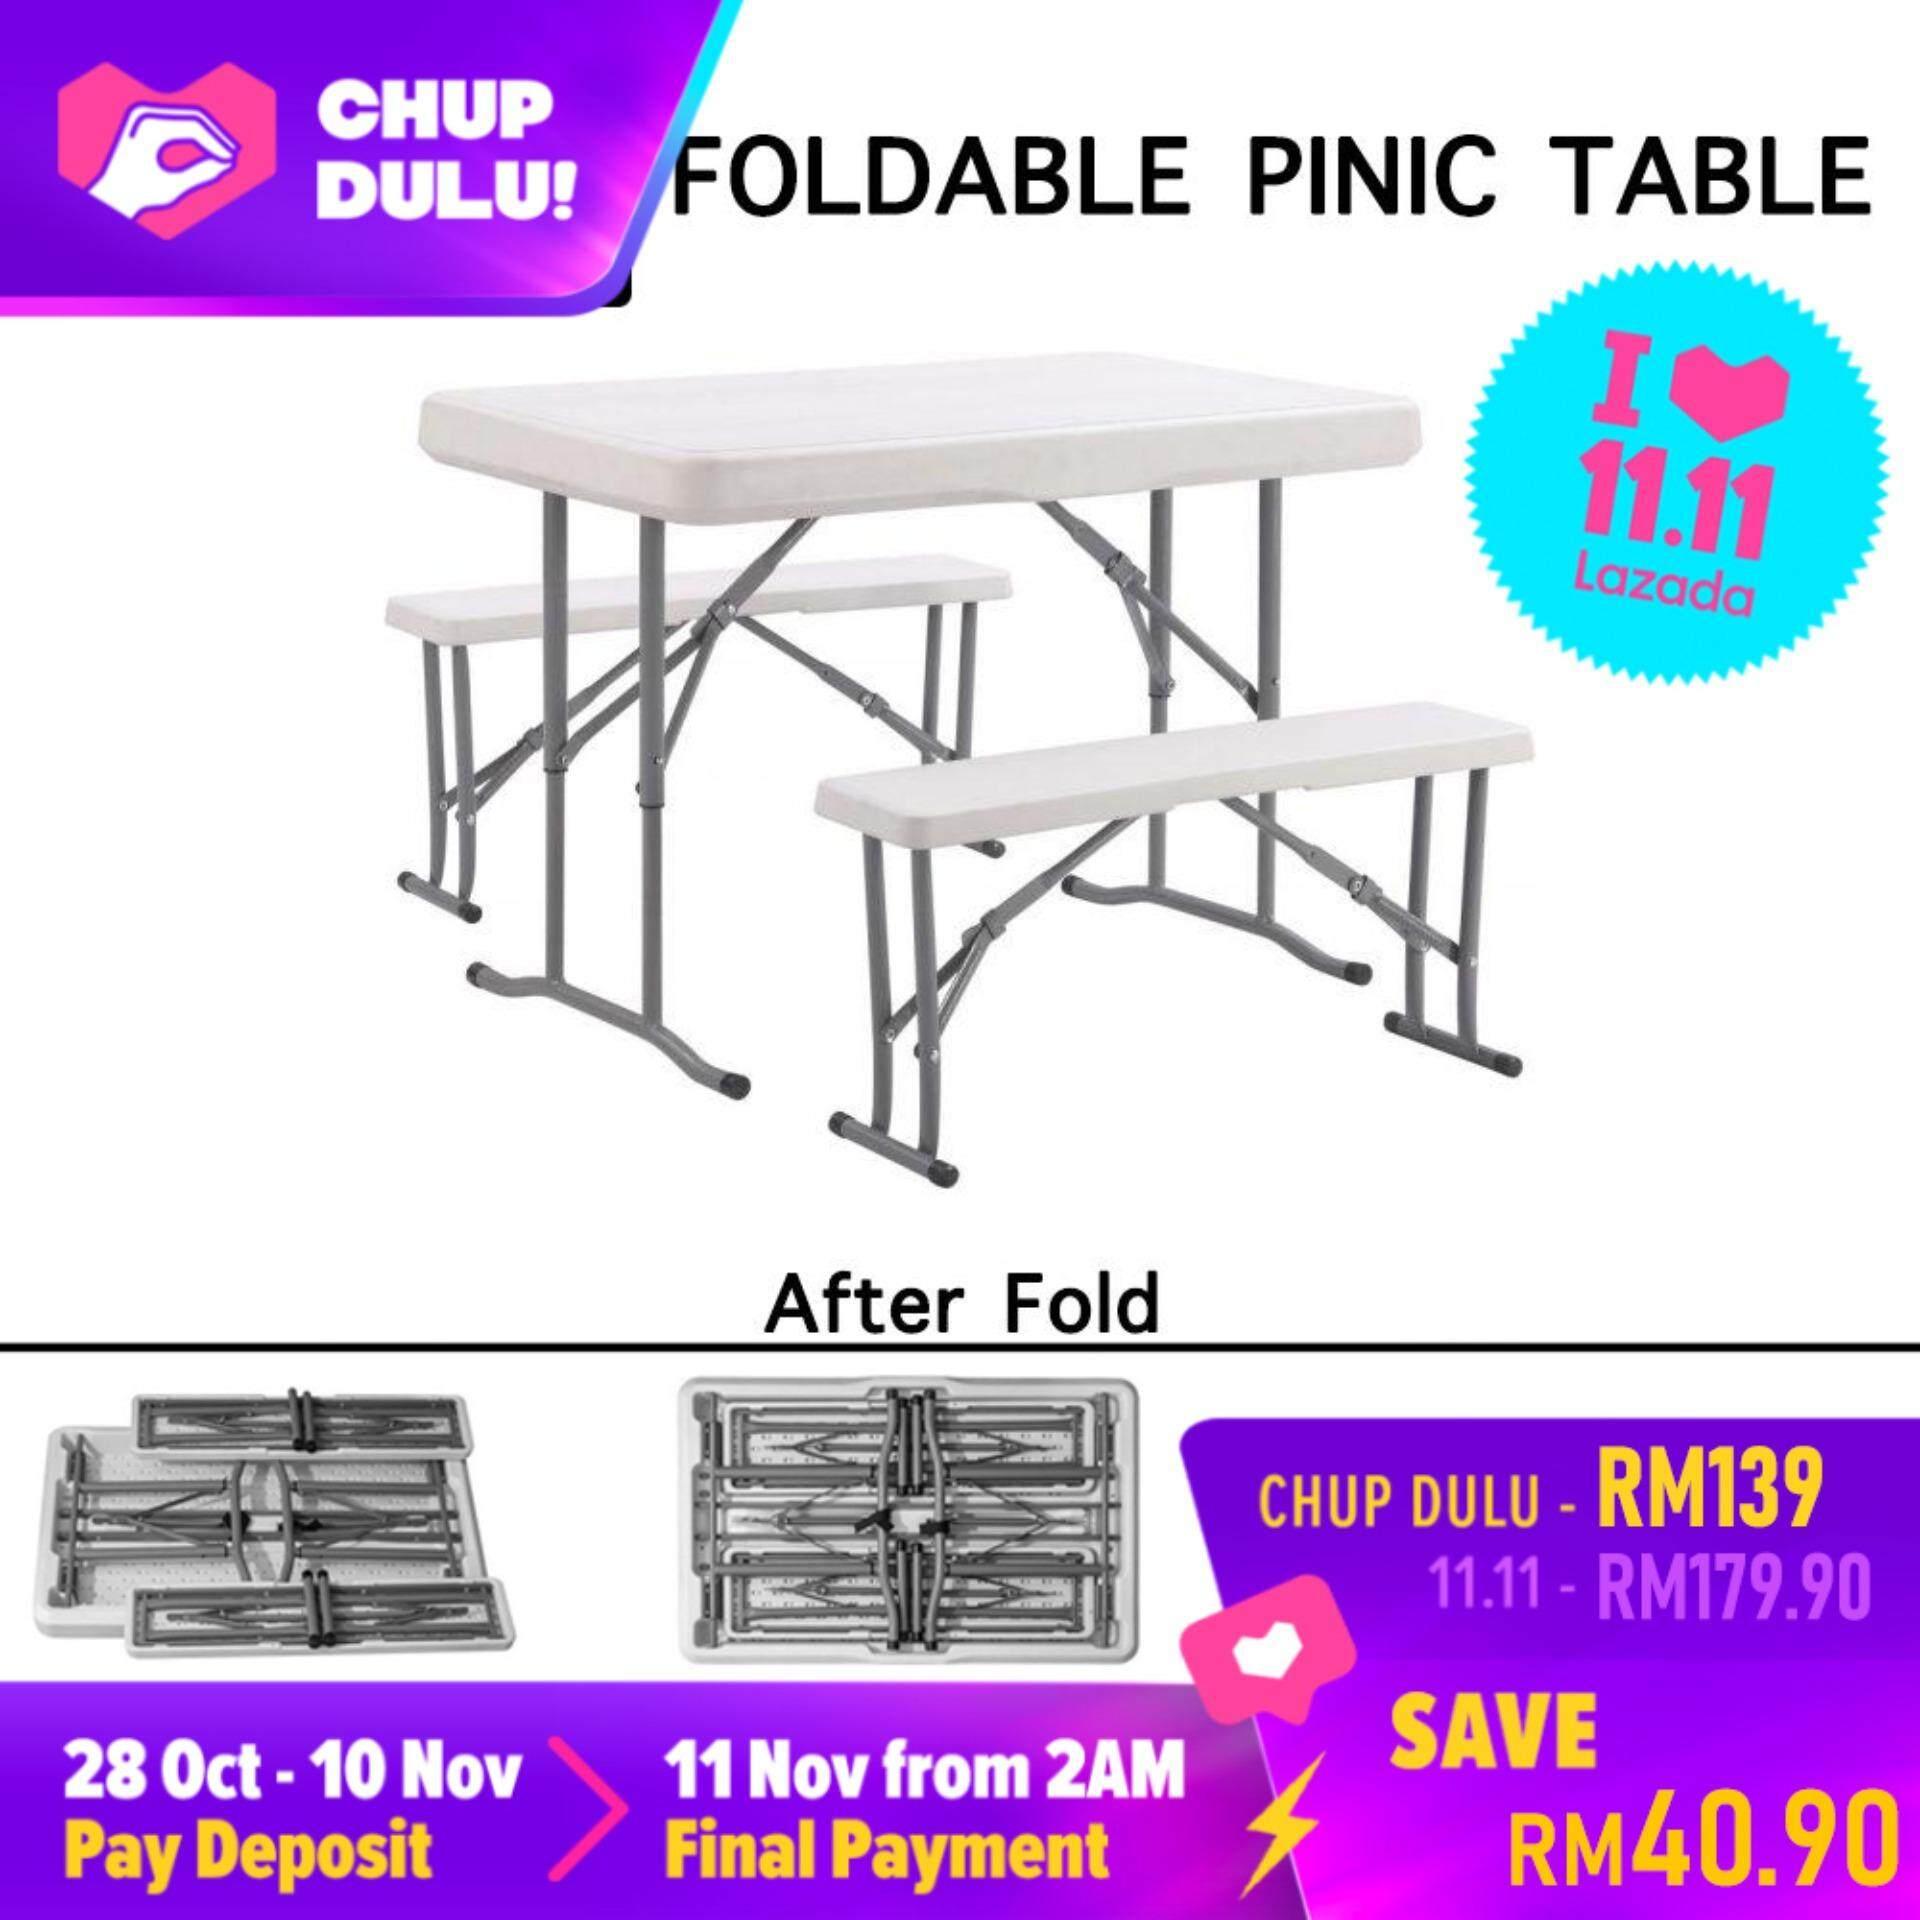 [11.11 CHUP DULU] SOKANO HQ-B105 Foldable Banquet Table with 2 Bench Catering Buffet Hall Folding Table Picnic Table Meja Lipat Banquet Niaga Dengan 2 Kerusi